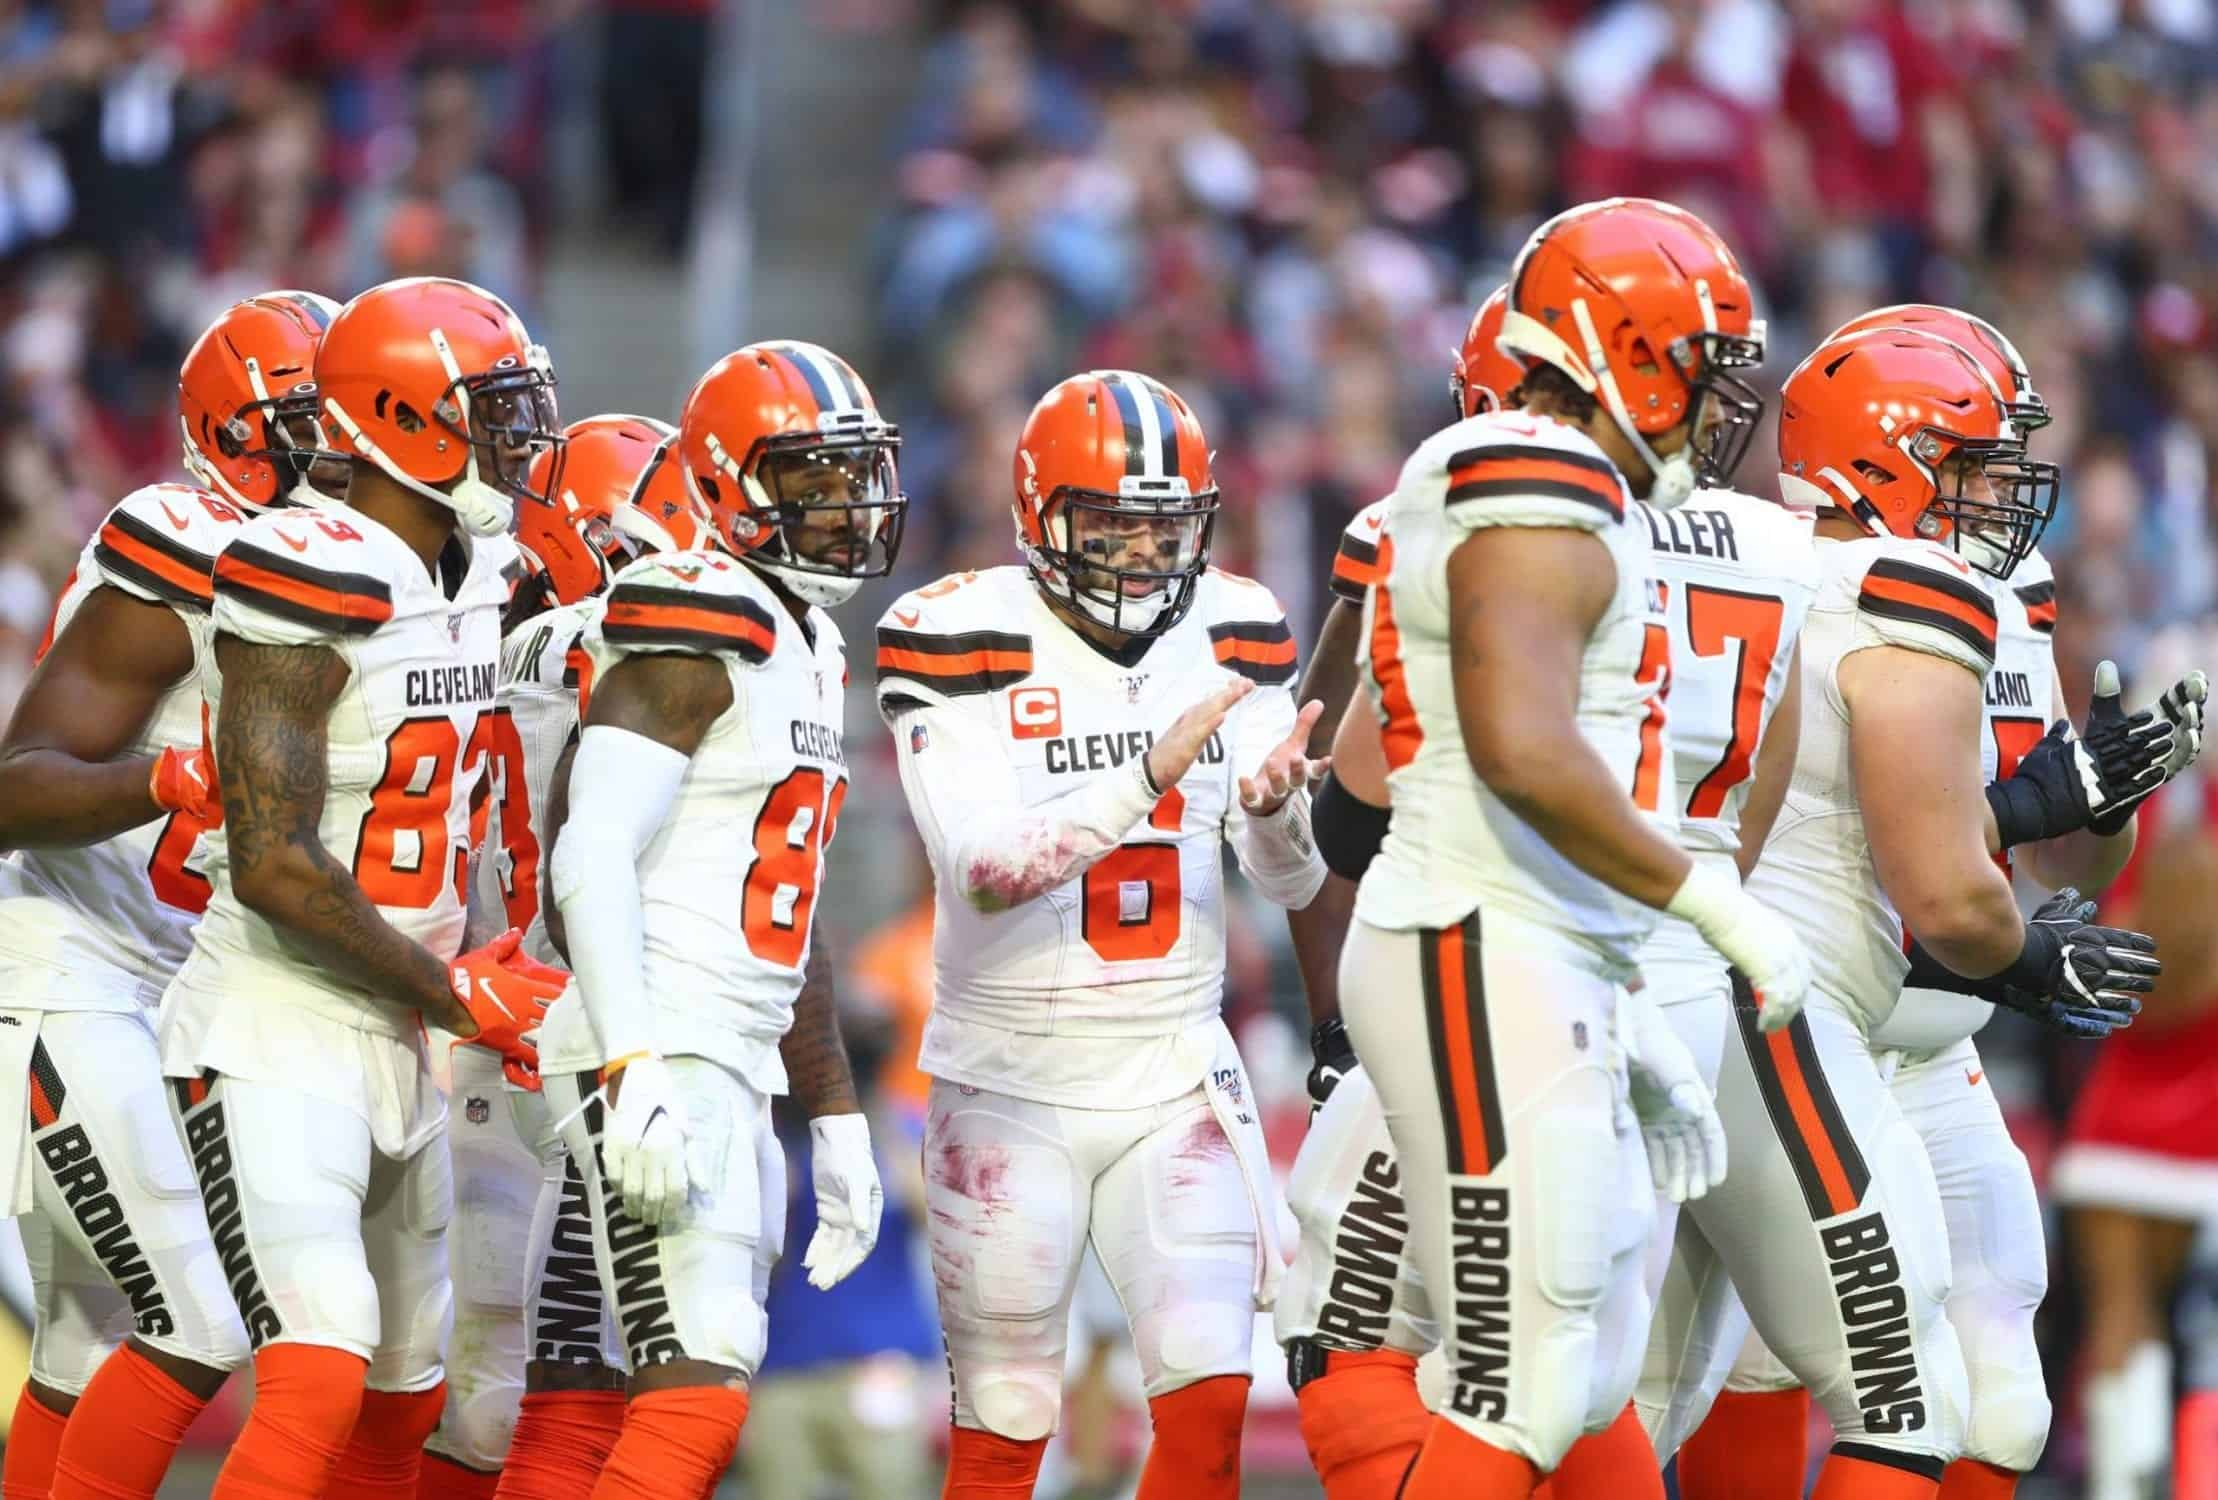 2020 NFL Draft: Cleveland Browns 7-round mock draft